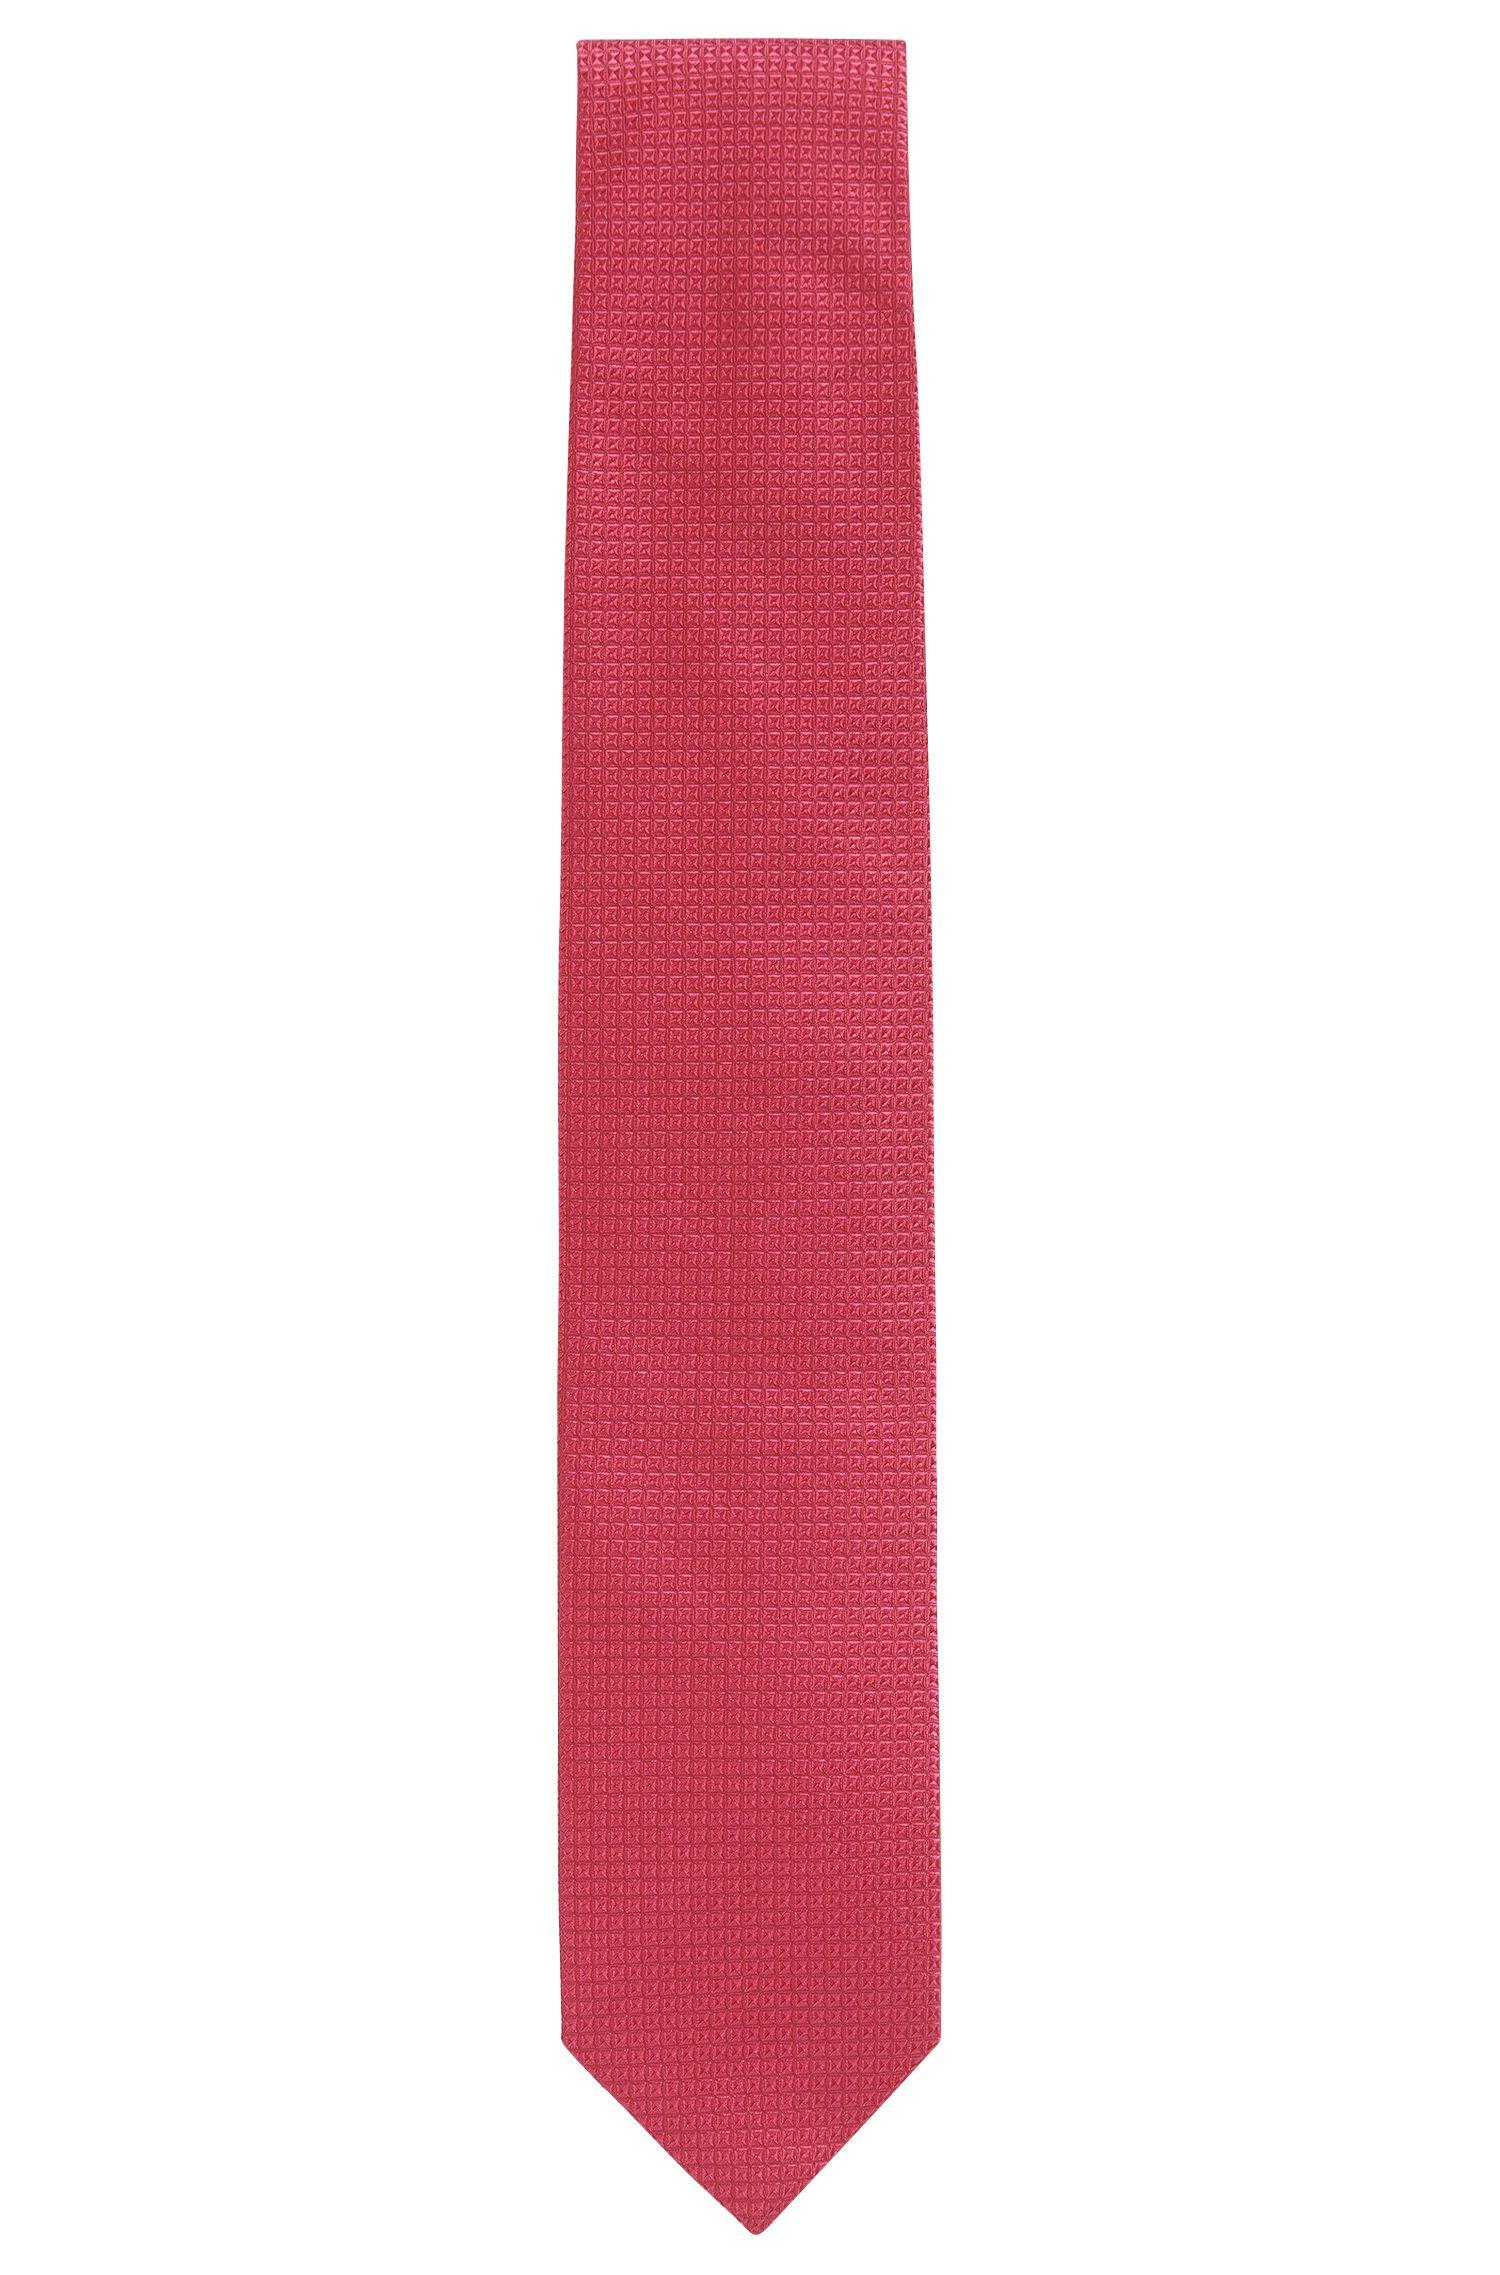 Microdiamond Italian Silk Tie